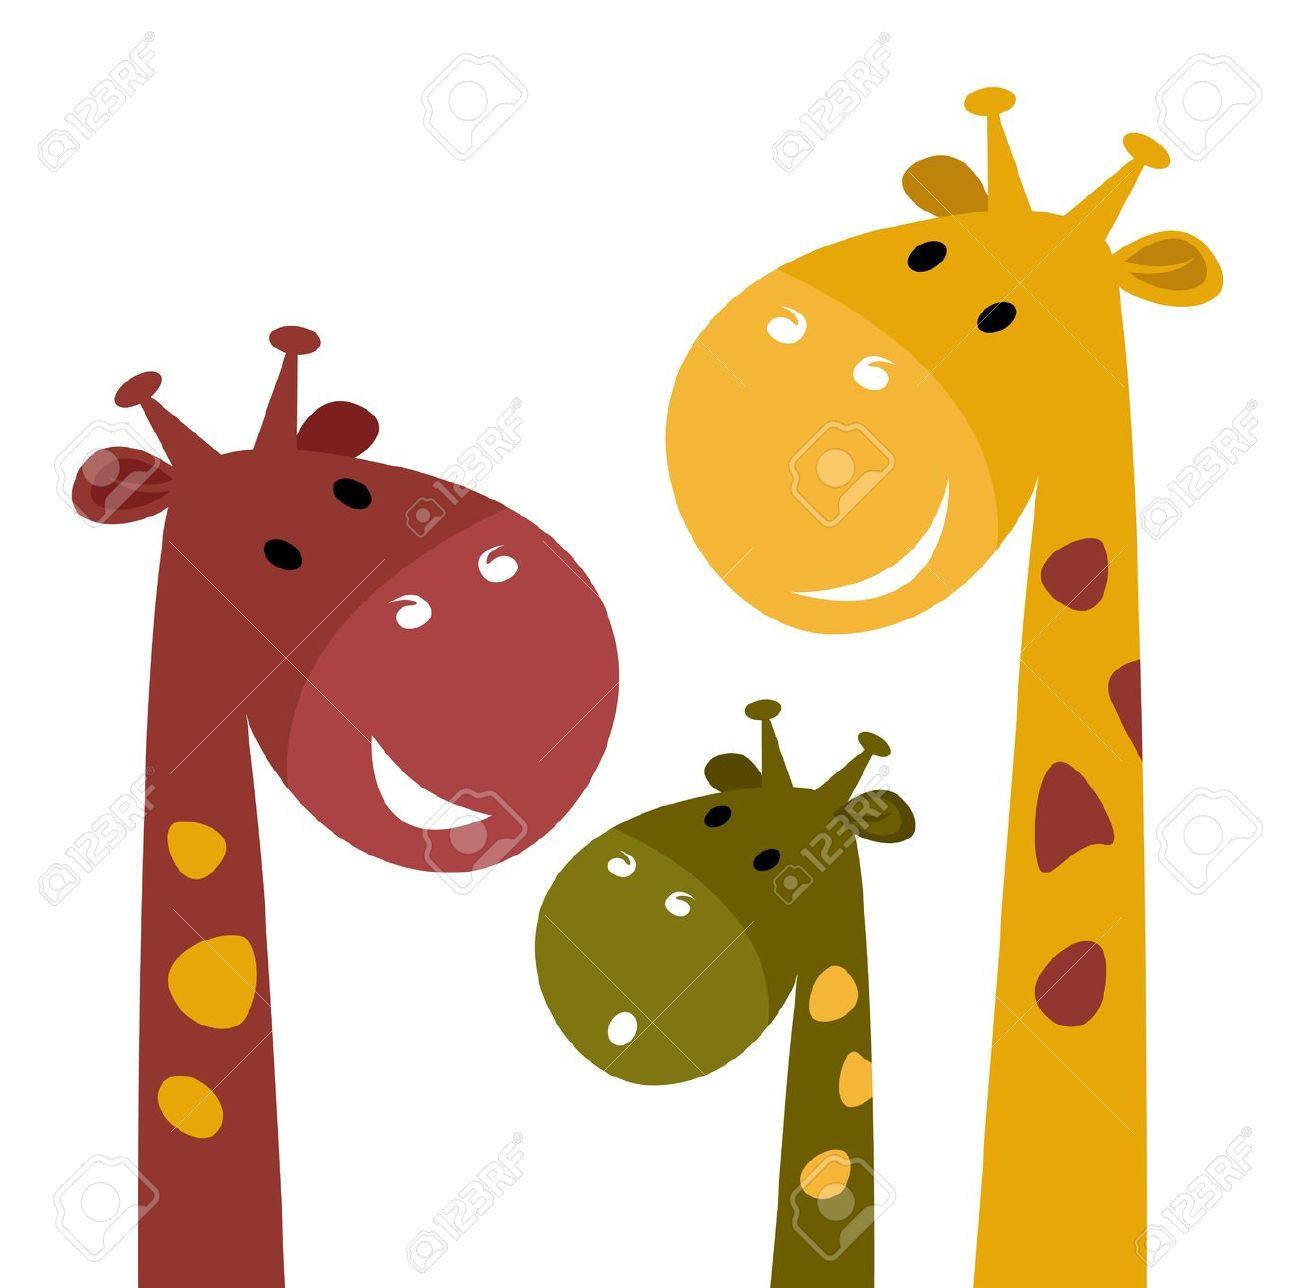 Giraffe clipart kostenlos clip royalty free stock 19,621 Giraffe Stock Vector Illustration And Royalty Free Giraffe ... clip royalty free stock